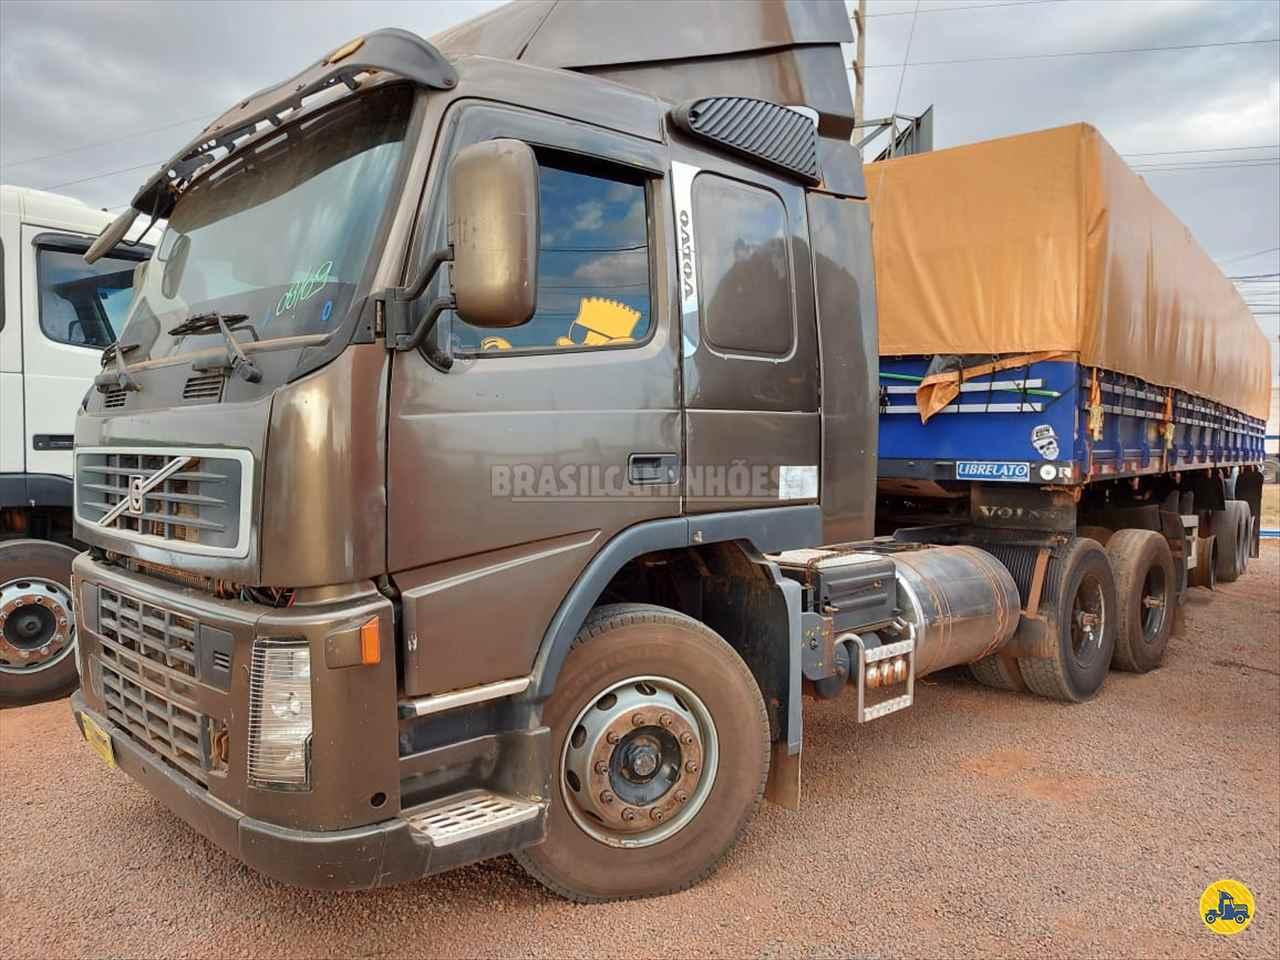 CAMINHAO VOLVO VOLVO FM 370 Carga Seca Truck 6x2 Brasil Caminhões Sinop SINOP MATO GROSSO MT